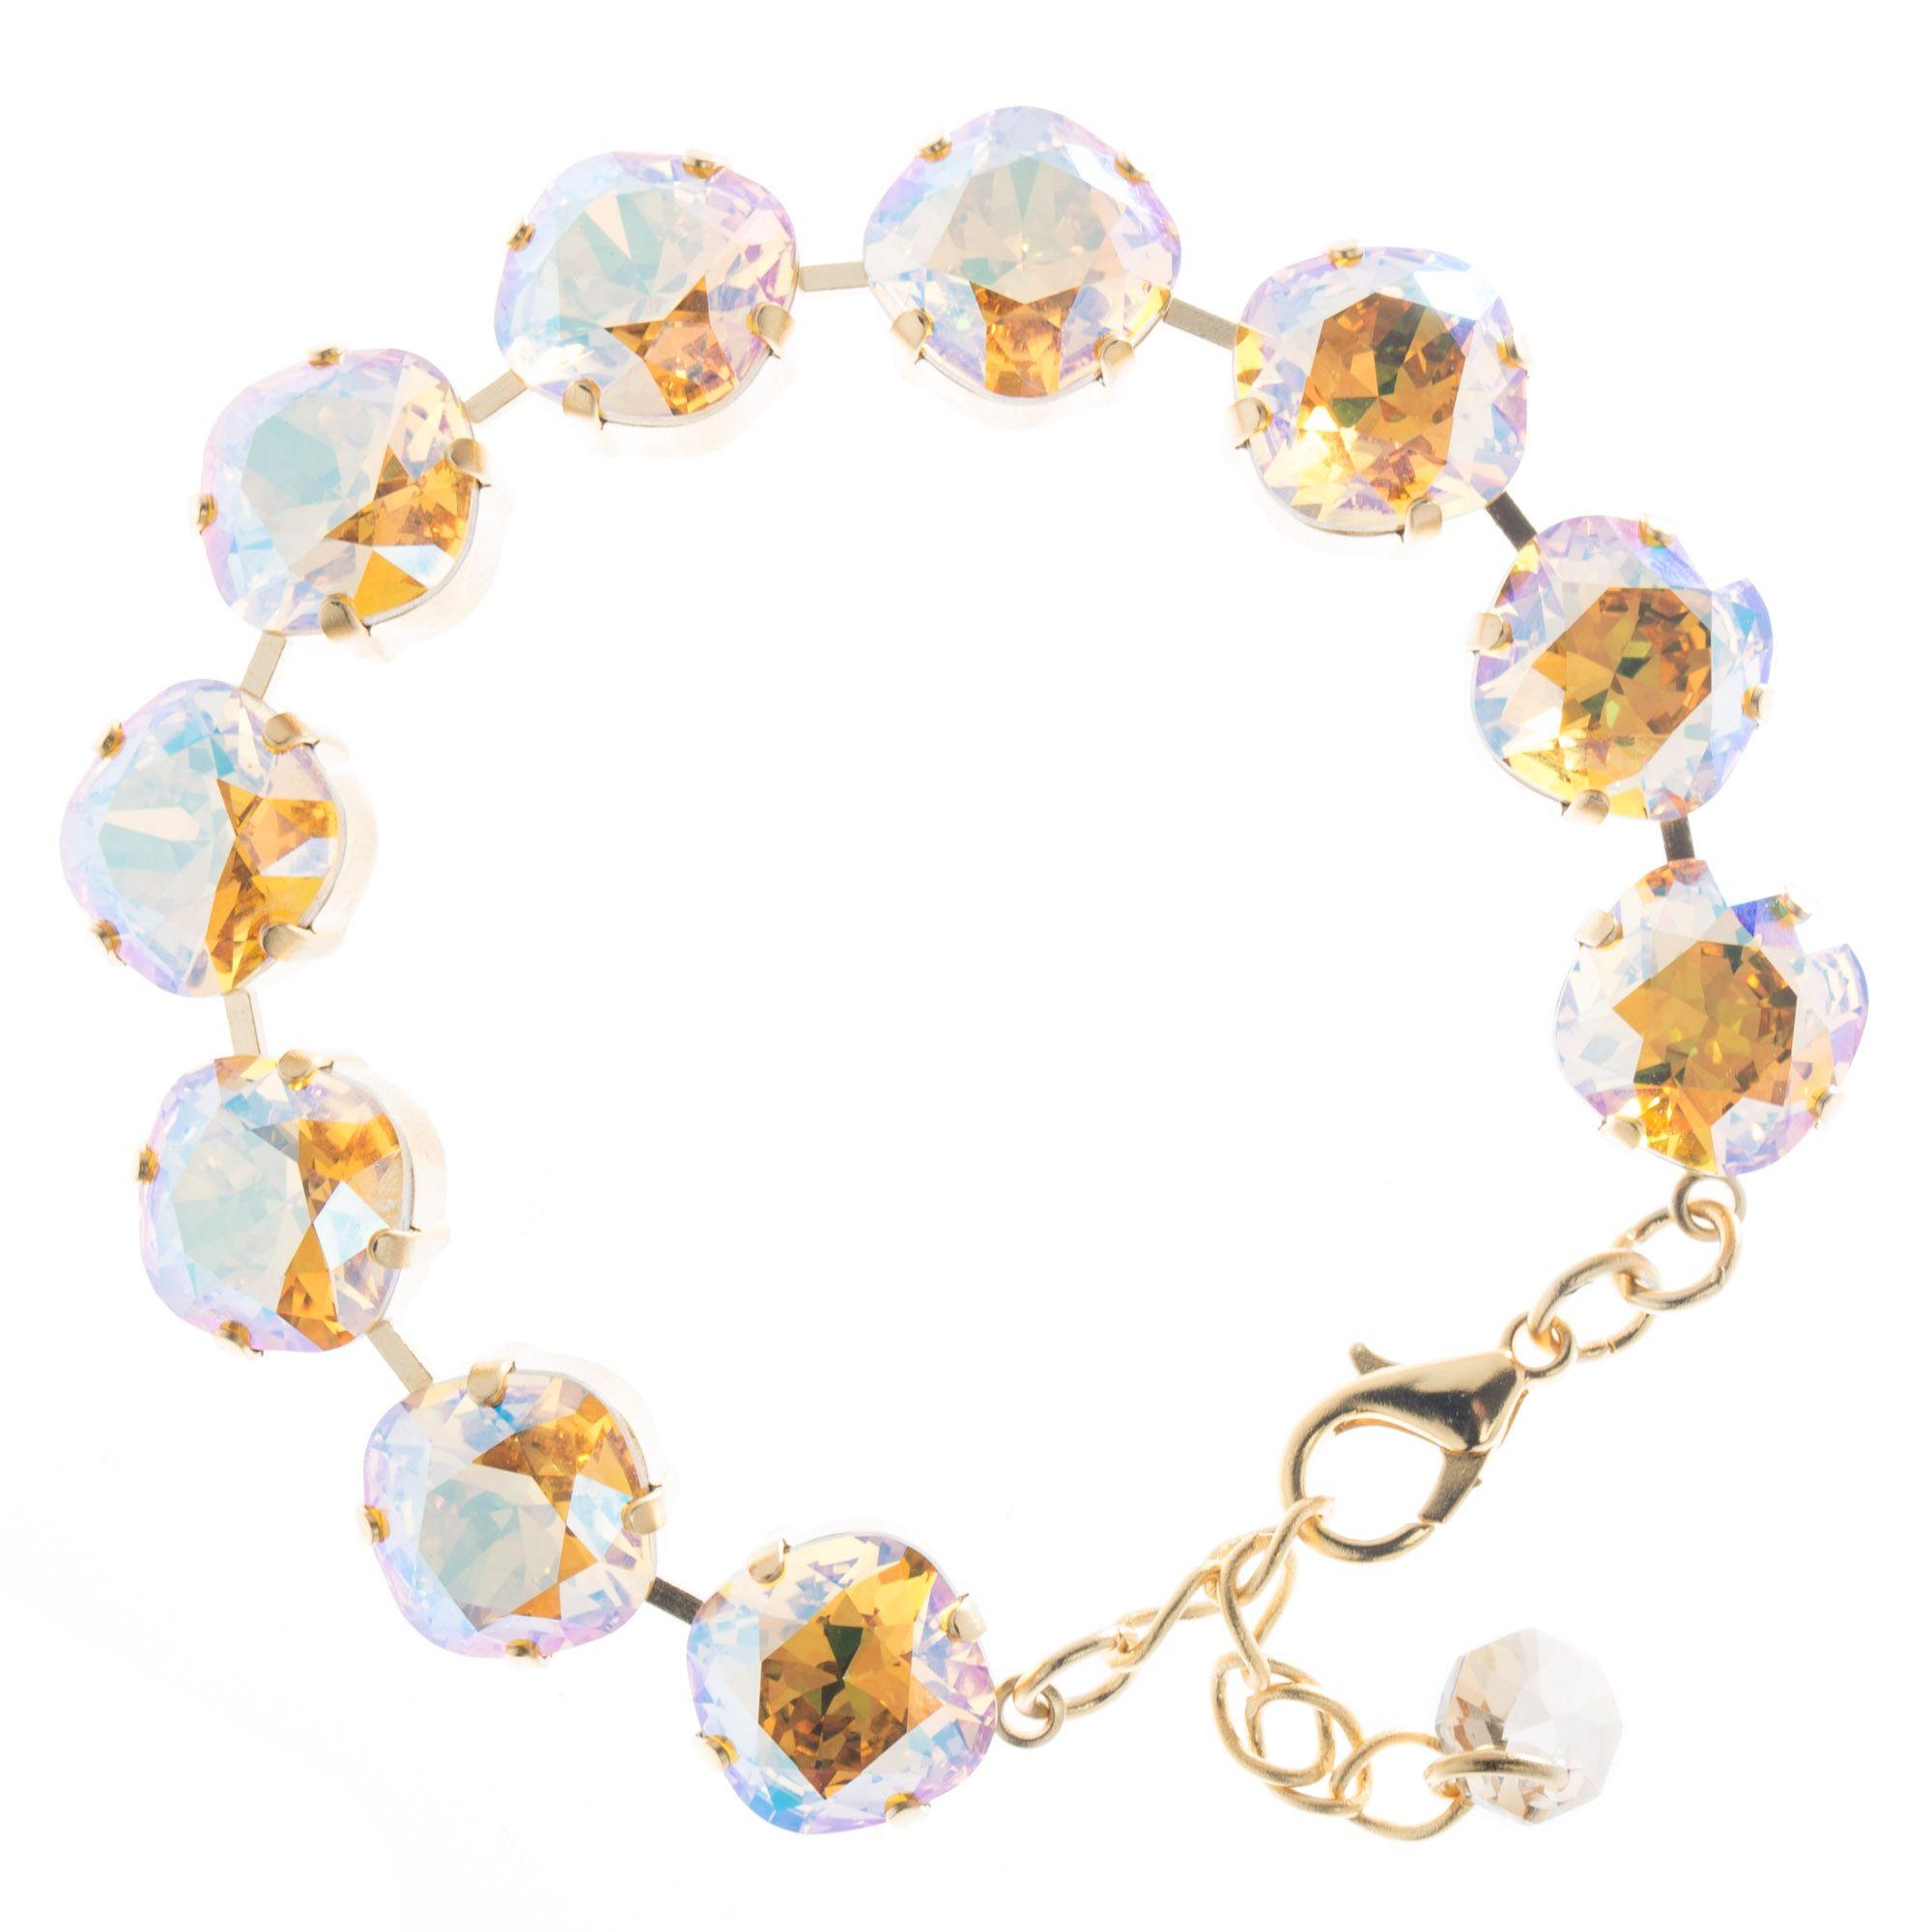 f88dda61a8e7e5 Lisa Marie Jewelry 12mm Square Swarovski Crystal Bracelet - Topaz Shimmer.  Tap to expand